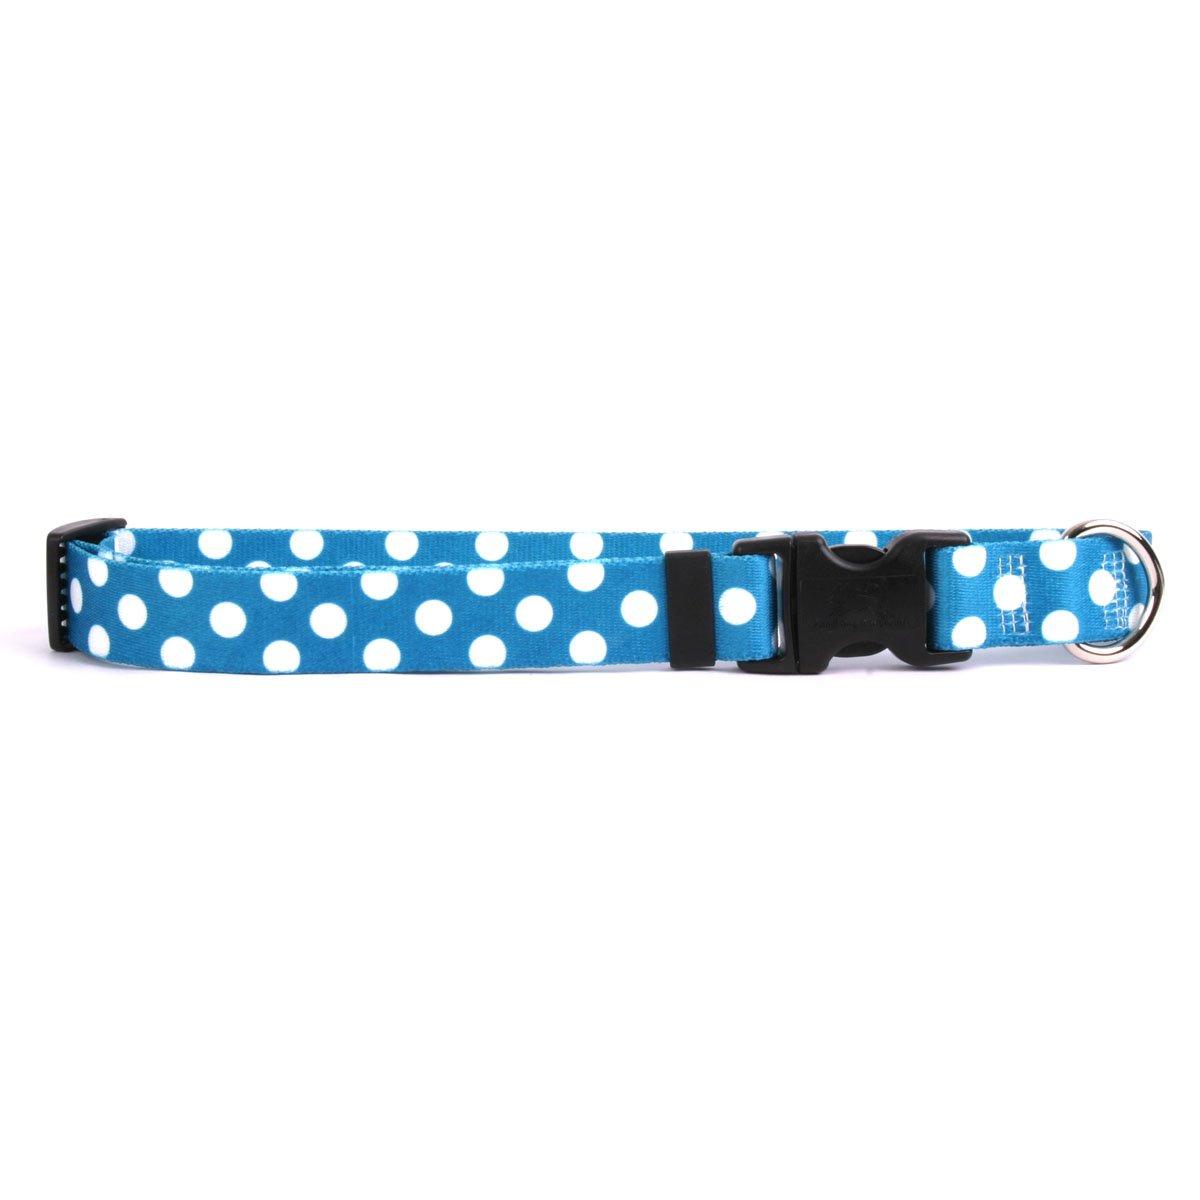 Yellow Dog Design Standard Easy-Snap Collar, Blueberry Polka Dot, Teacup 4'' - 9''